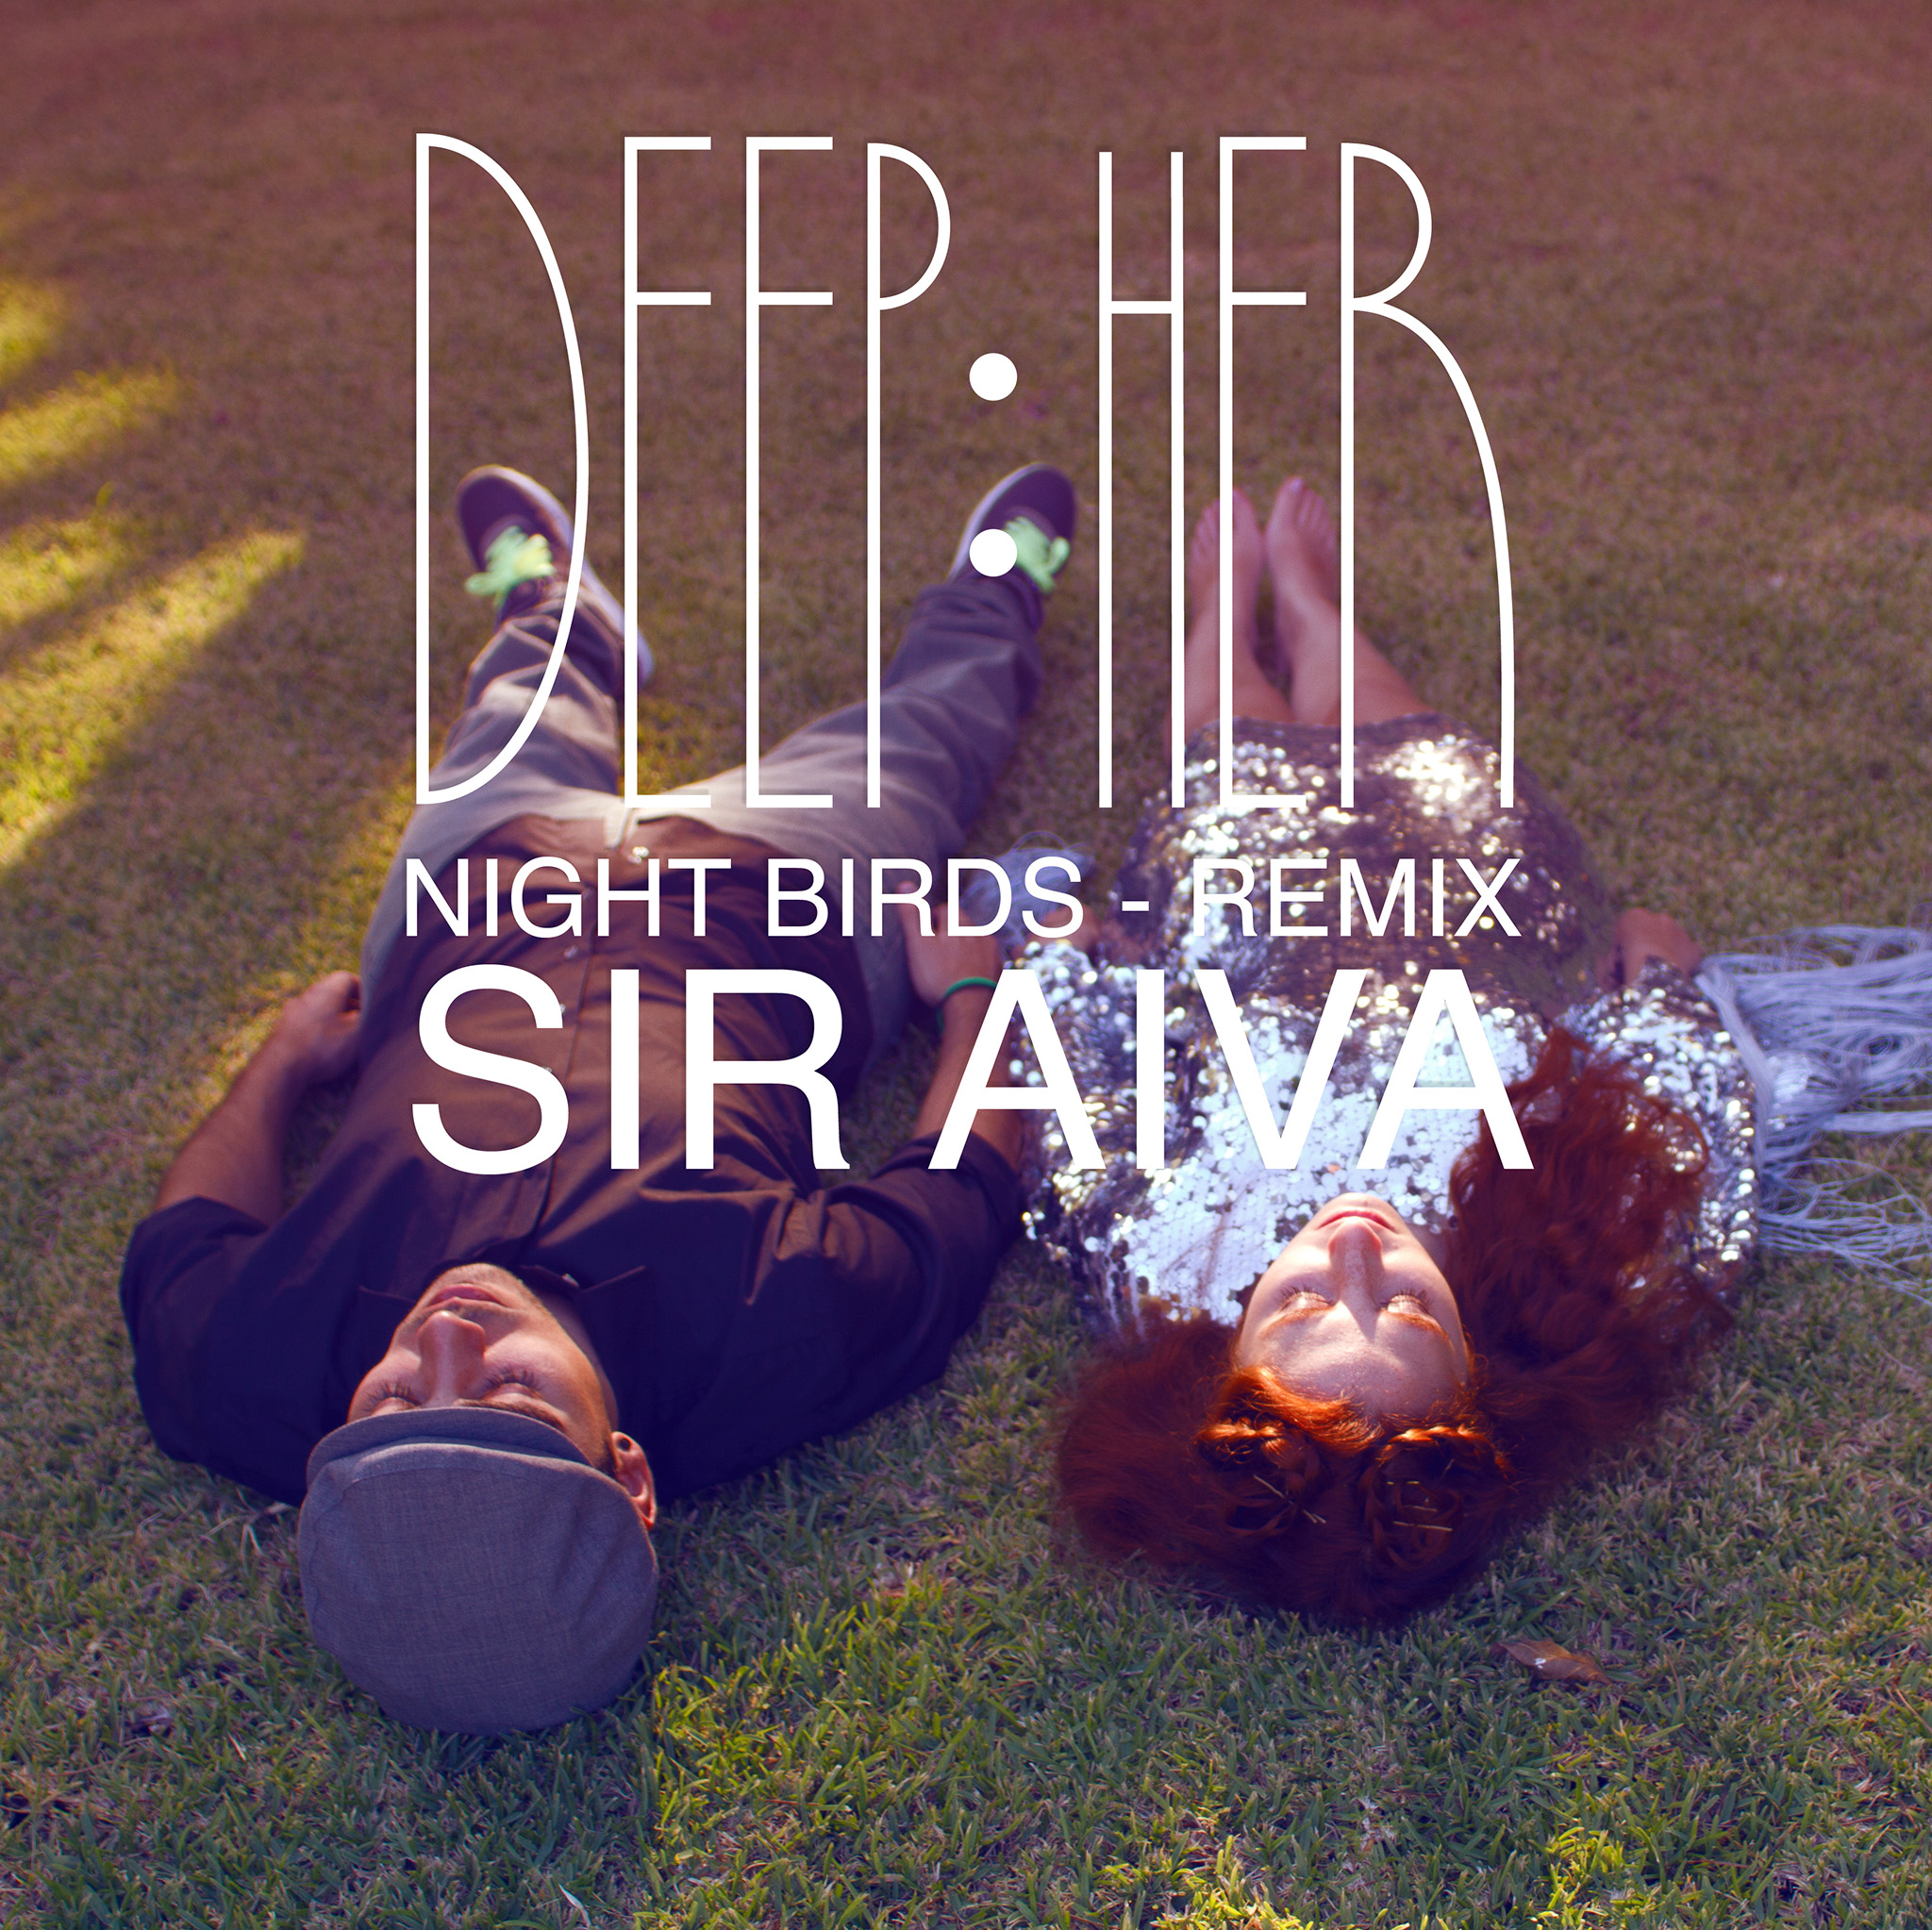 Deep:her - Night Birds (Sir Aiva Remix)